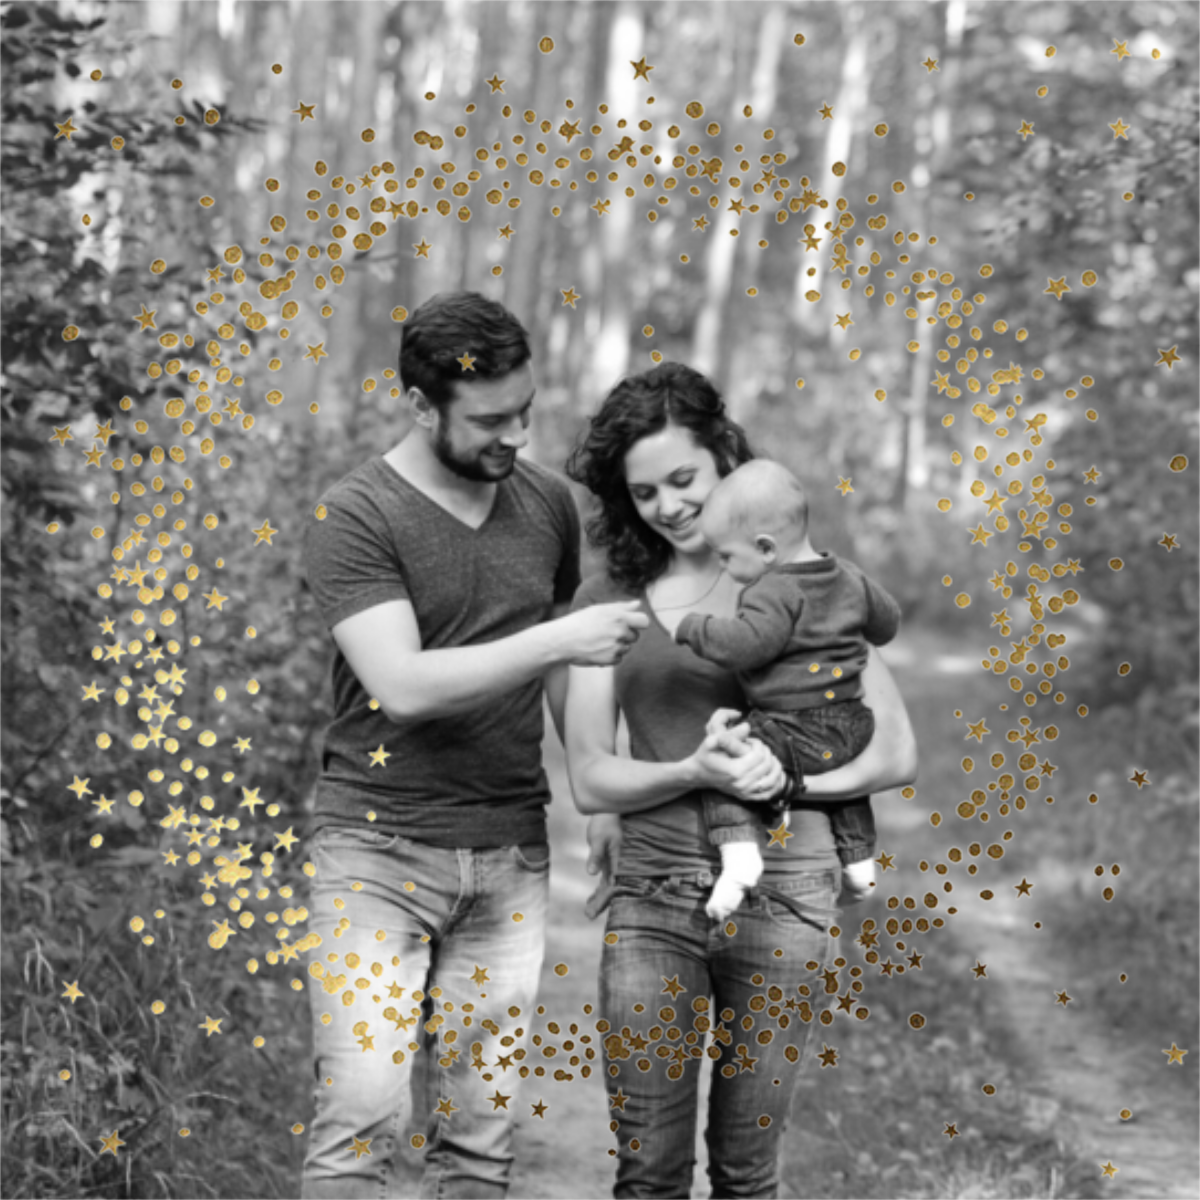 Wreath of Stars Photo - Paperless Post - New Year